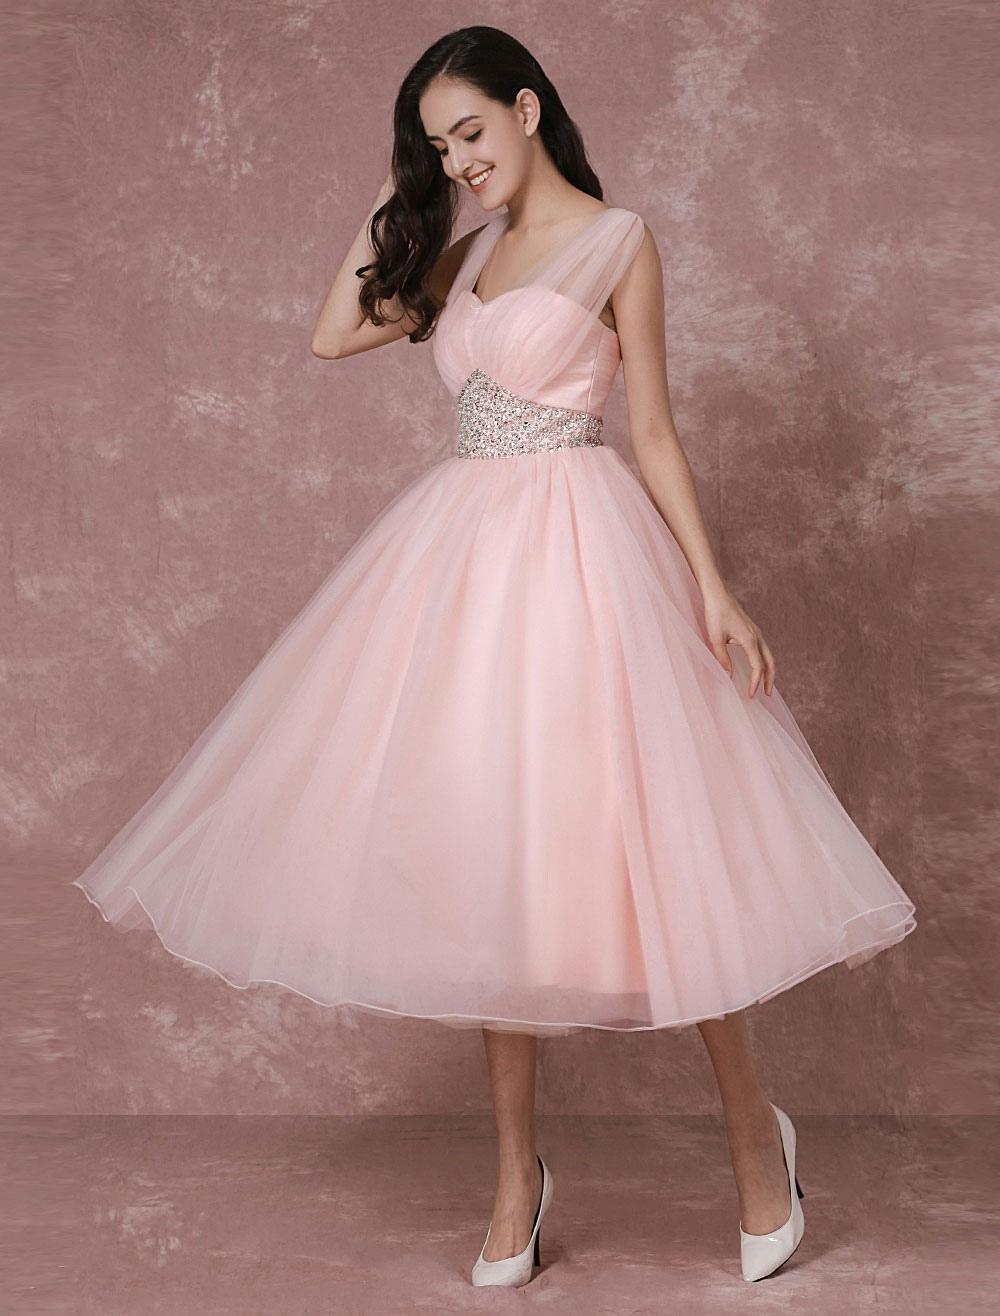 Tulle Wedding Dress Pink Bridal Dress Short Backless A-line Cocktail Dress Milanoo (Pink Wedding Dress) photo